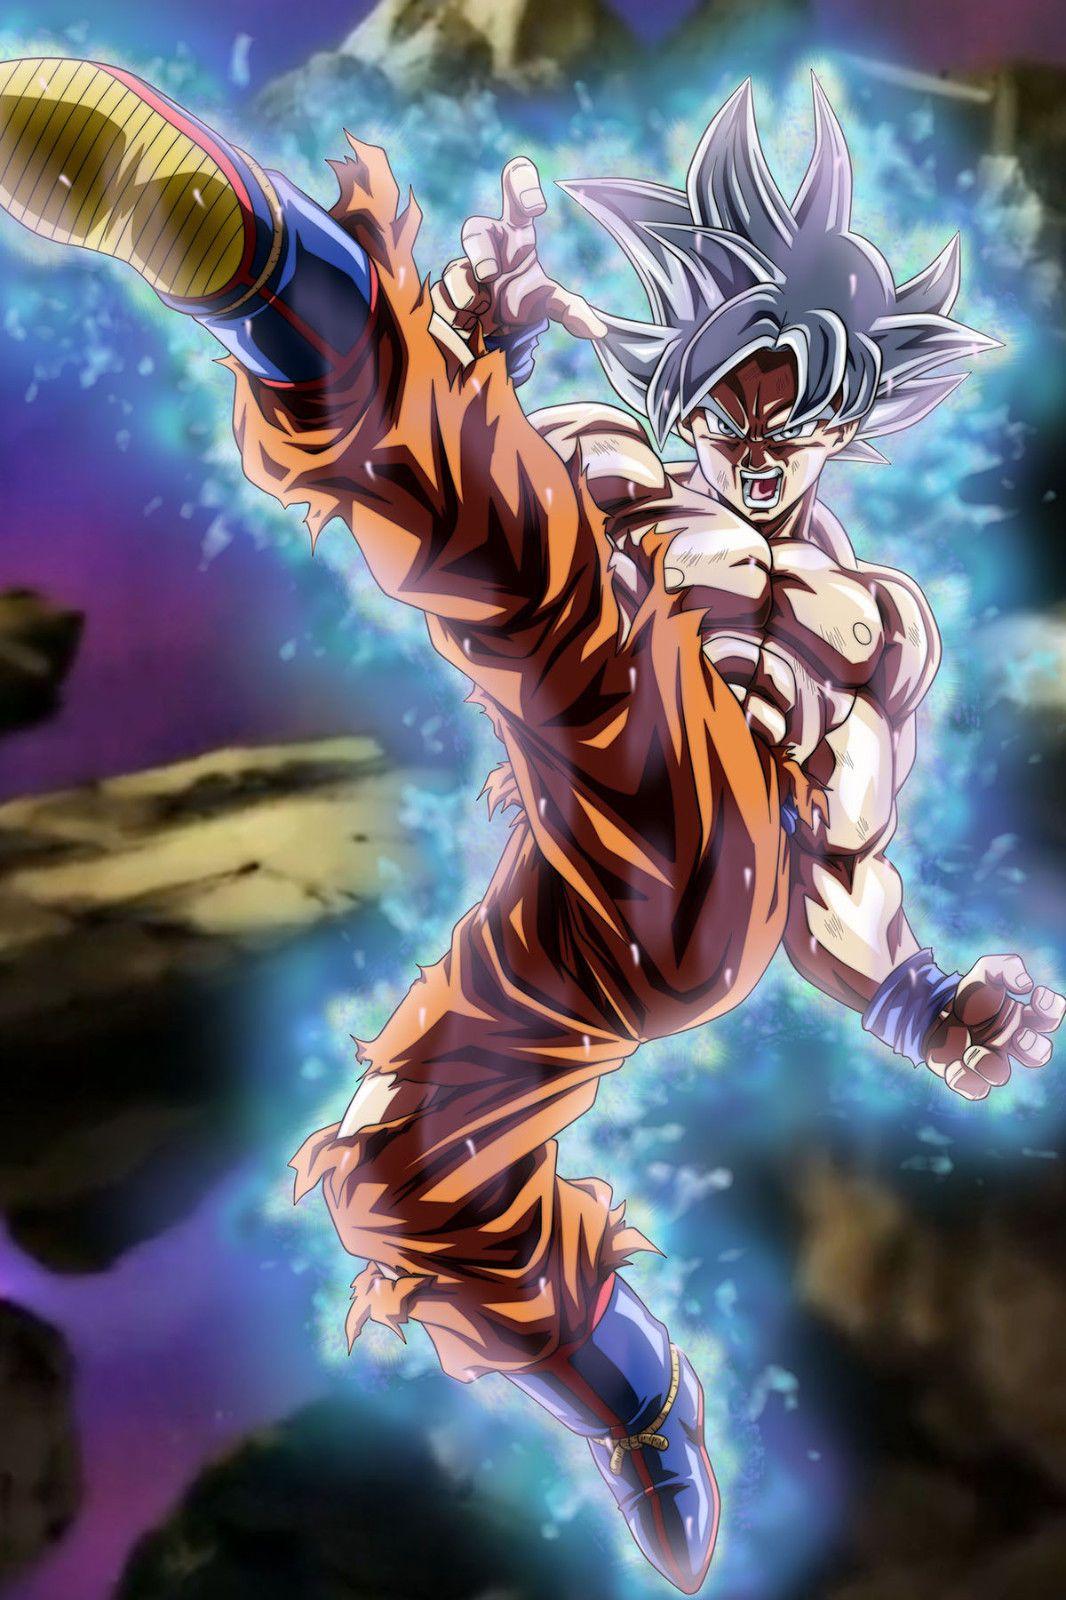 Dragon Ball Super Poster Goku Ultra Instinct Mastered Kicking 12in X 18in Ebay Dragon Ball Super Goku Anime Dragon Ball Super Dragon Ball Super Manga